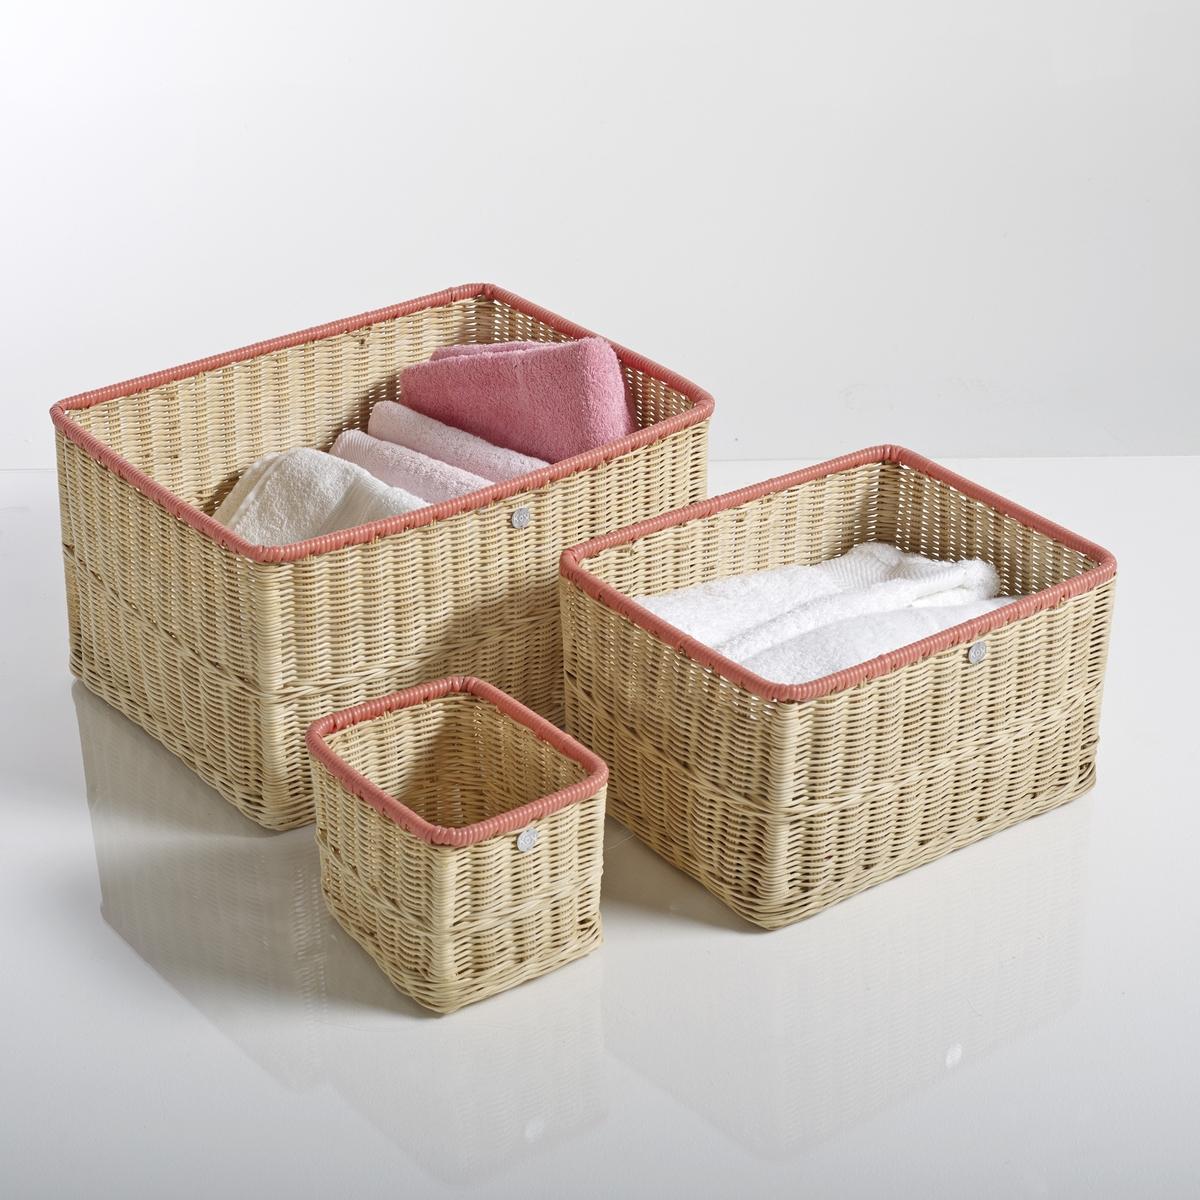 Корзинки для хранения вещей KOK Ozier ( 3 шт.)